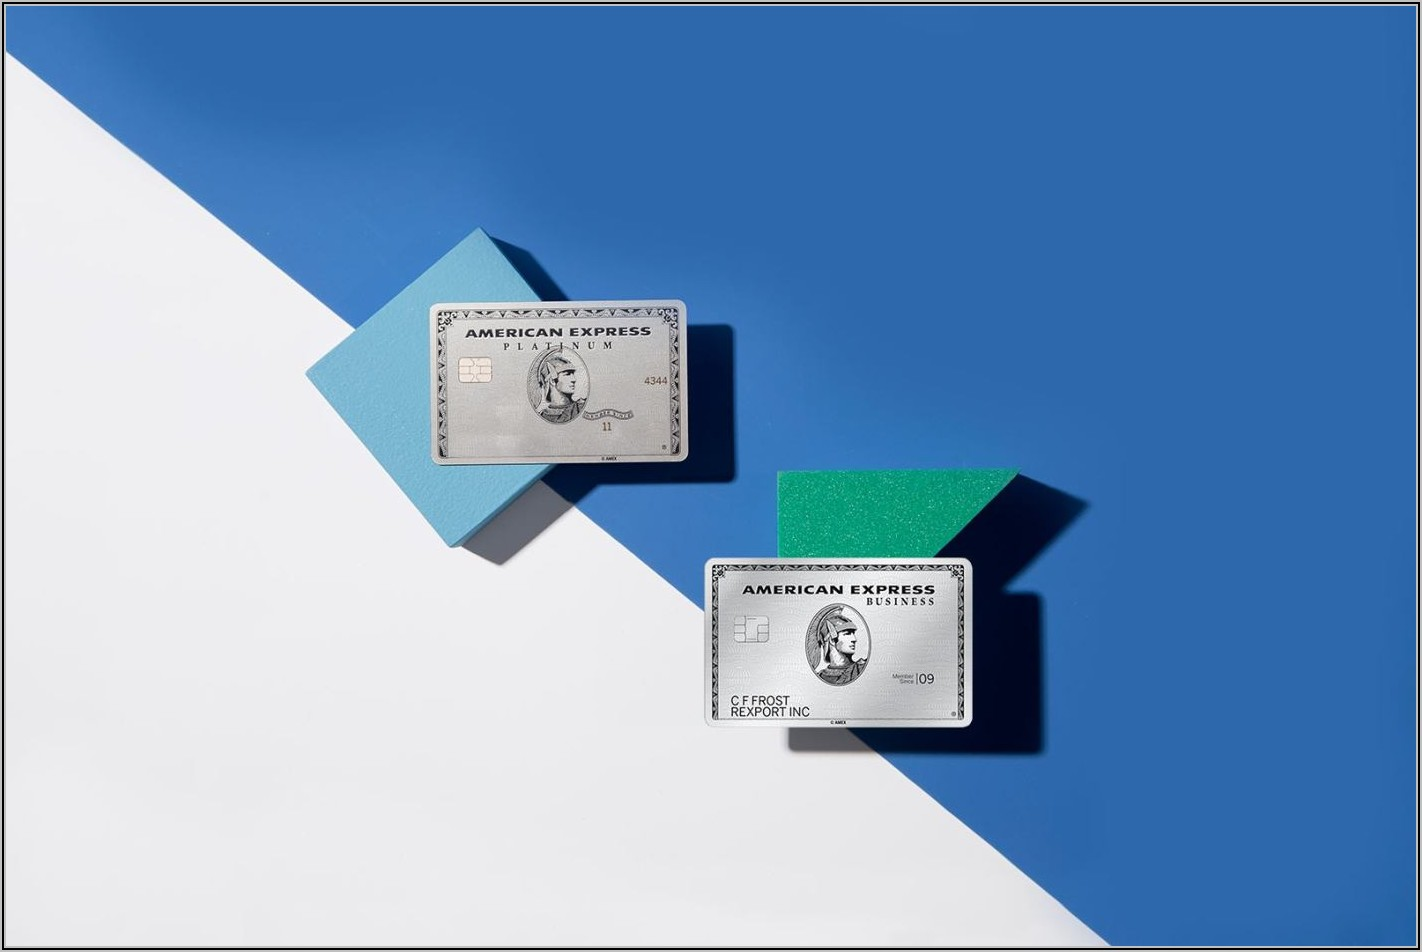 Amex Business Platinum Additional Card Benefits